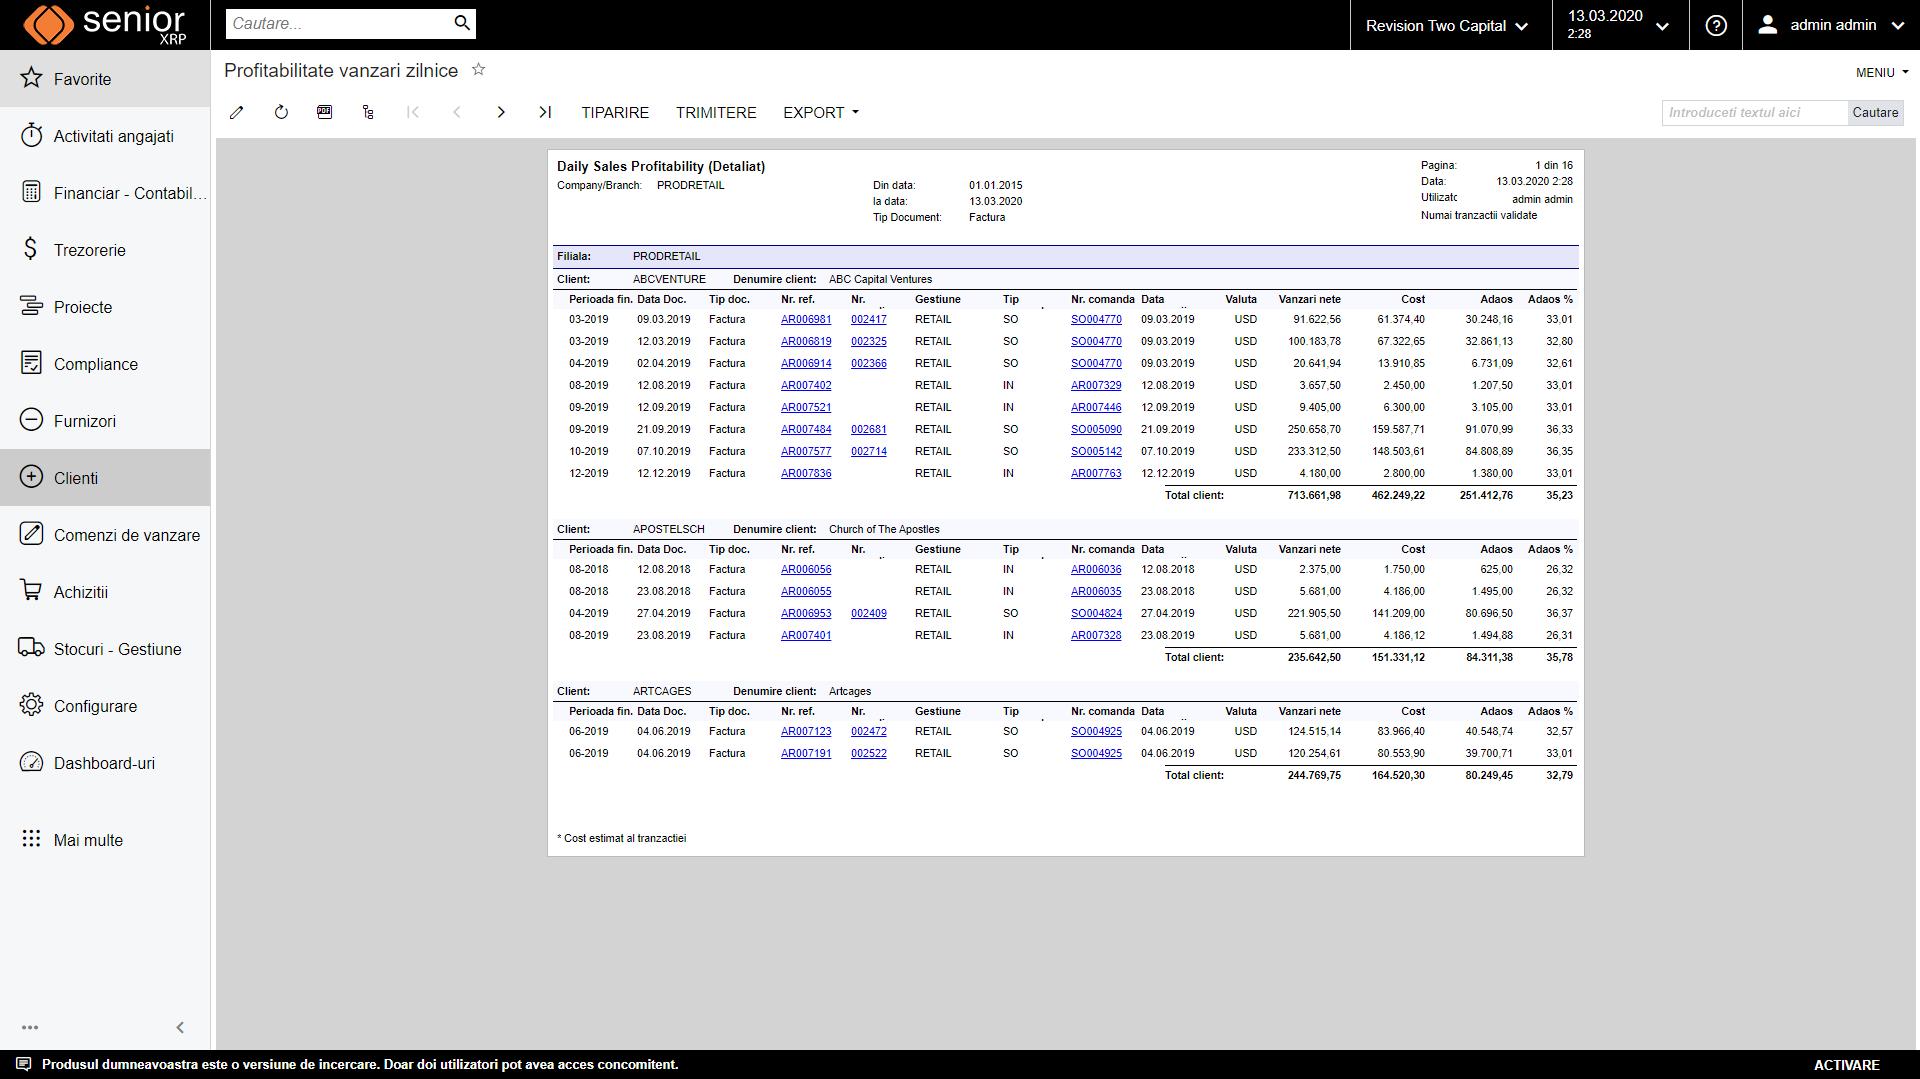 raport profitabilitate vanzari clienti